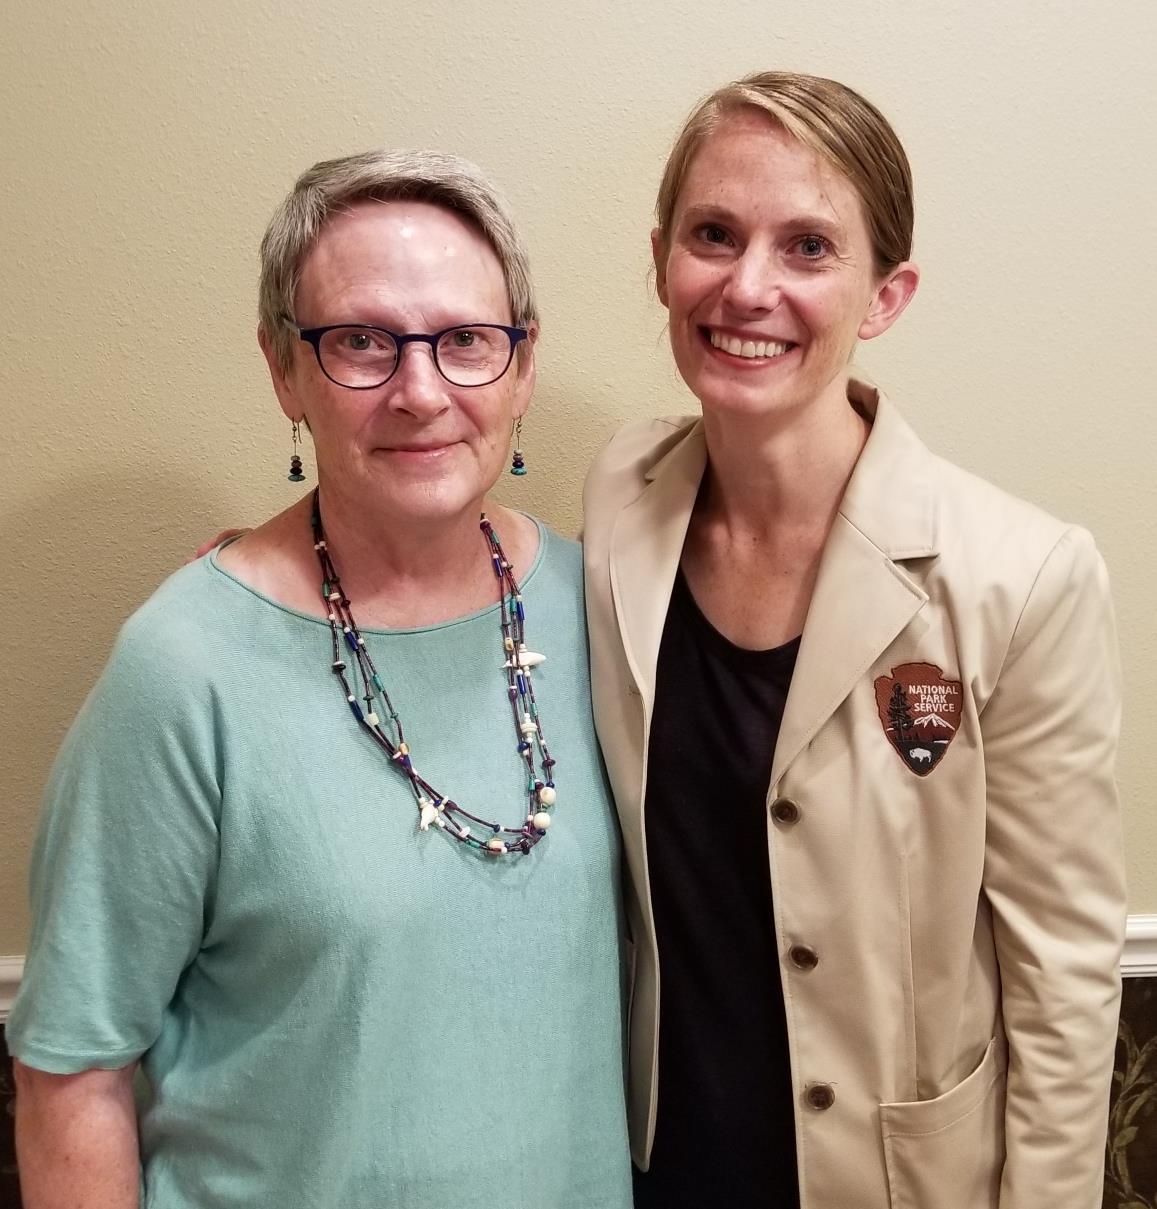 Stories | Rotary Club of Iowa City A M